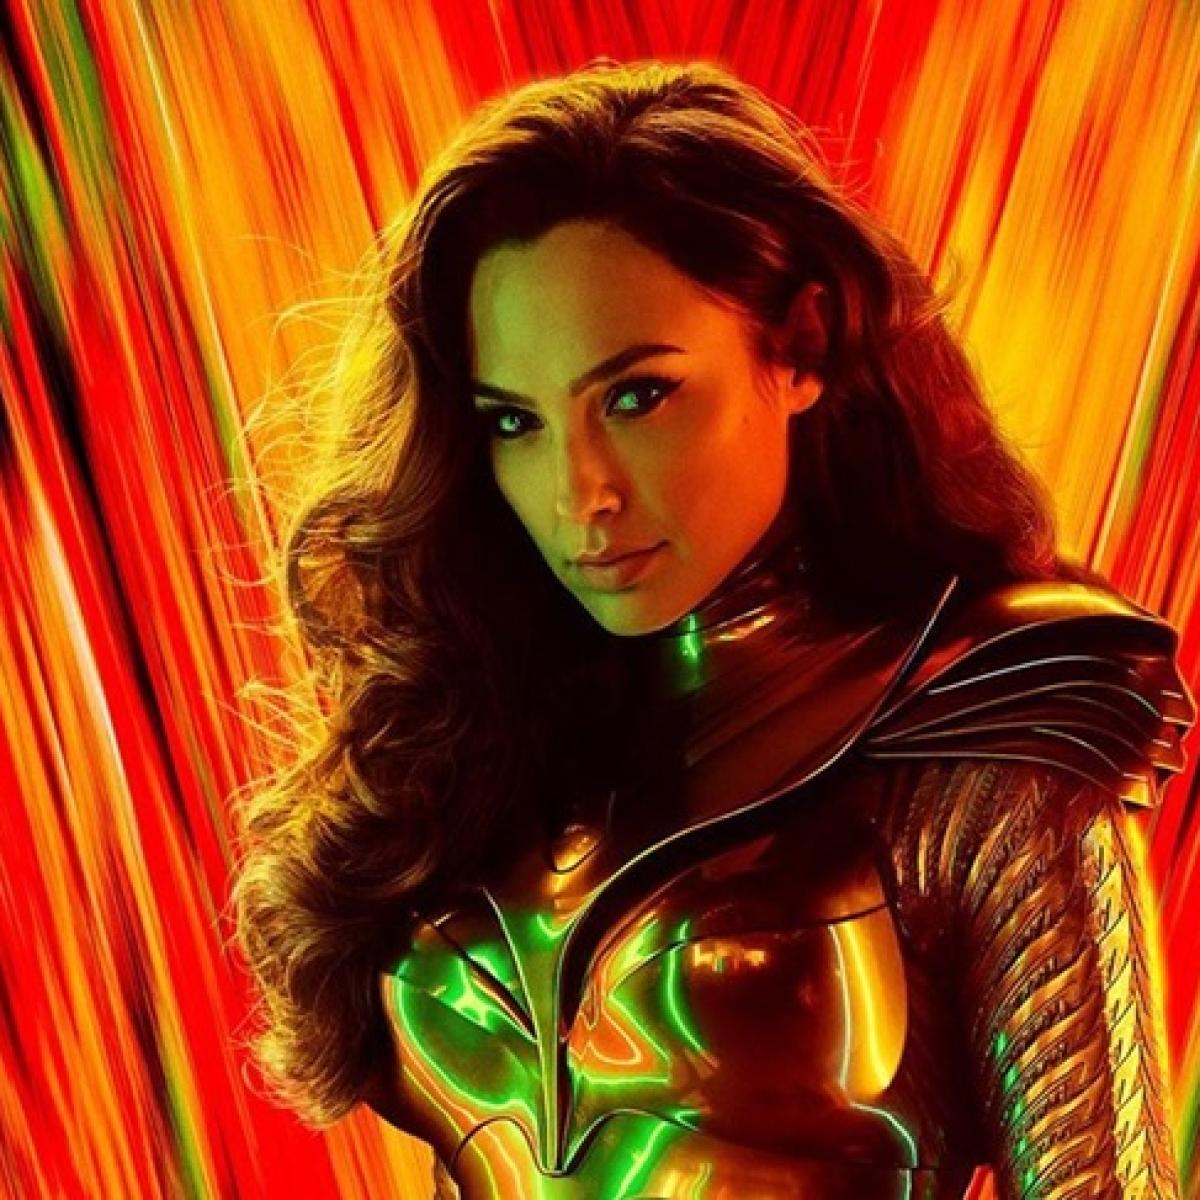 Gal Gadot teases queer romance in 'Wonder Woman'